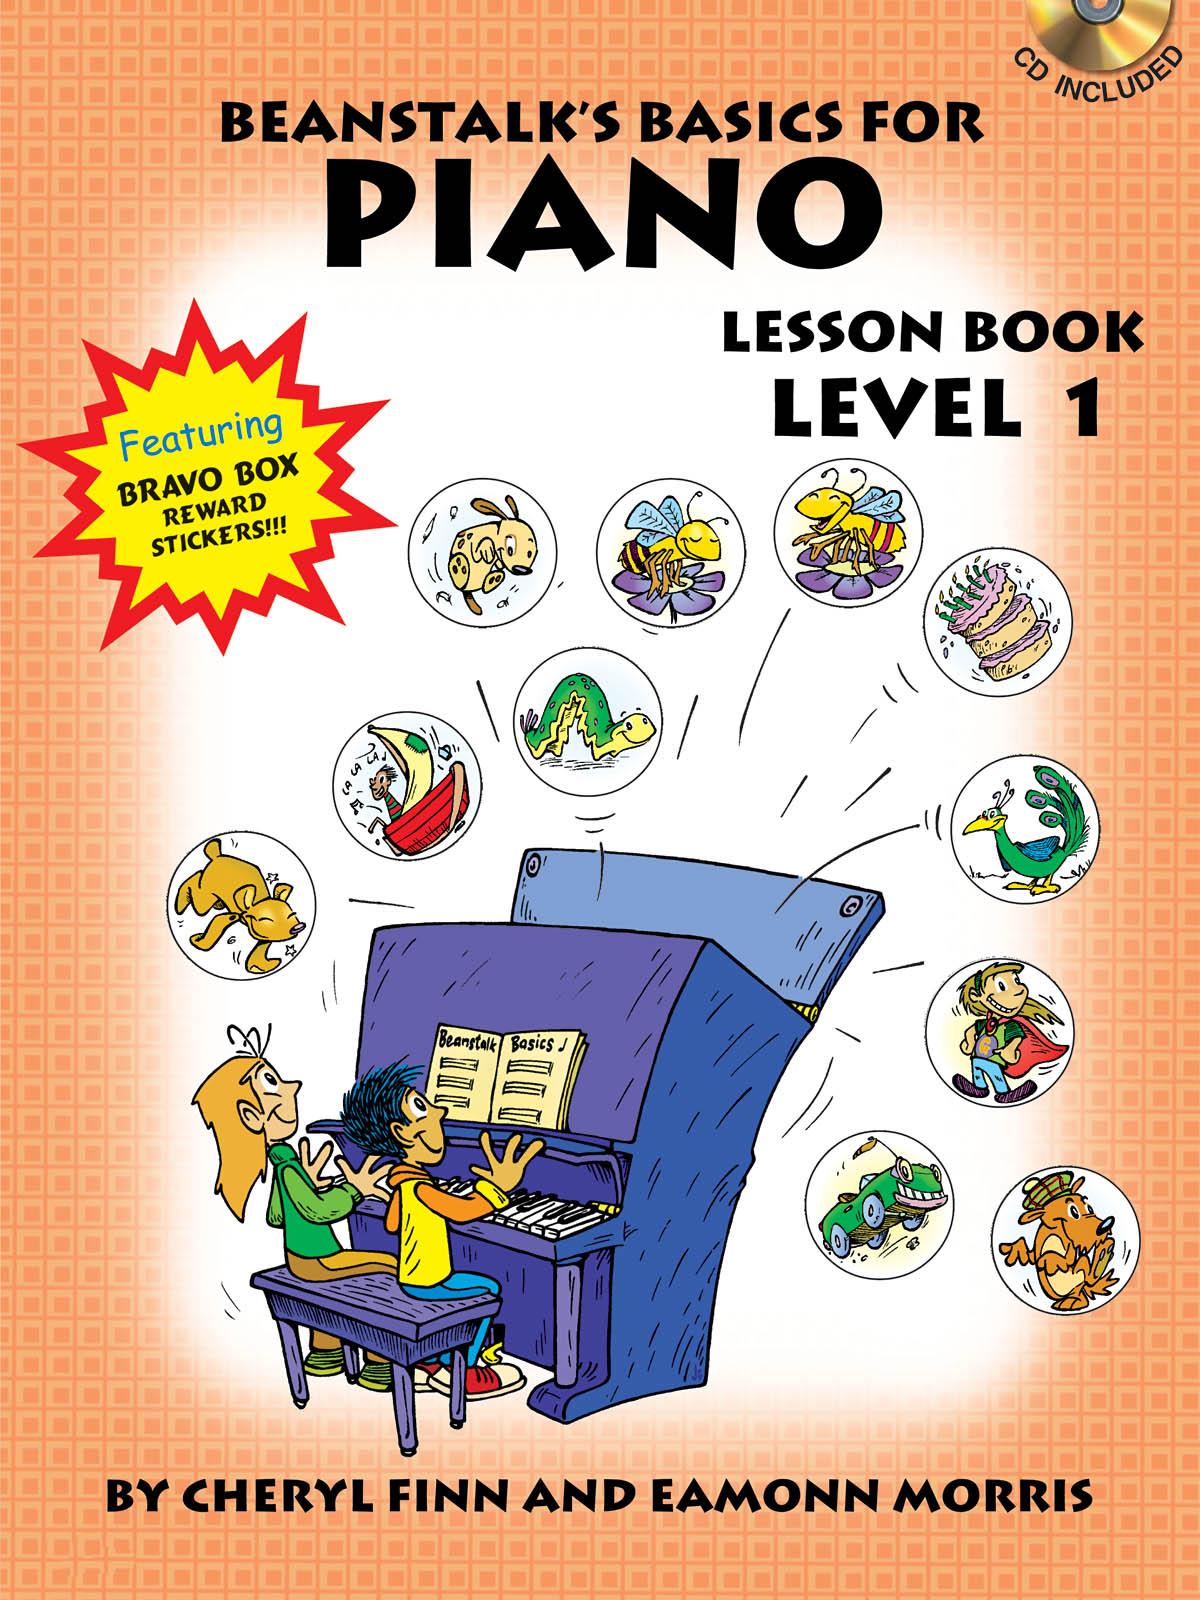 Cheryl Finn: Beanstalk's Basics for Piano: Piano